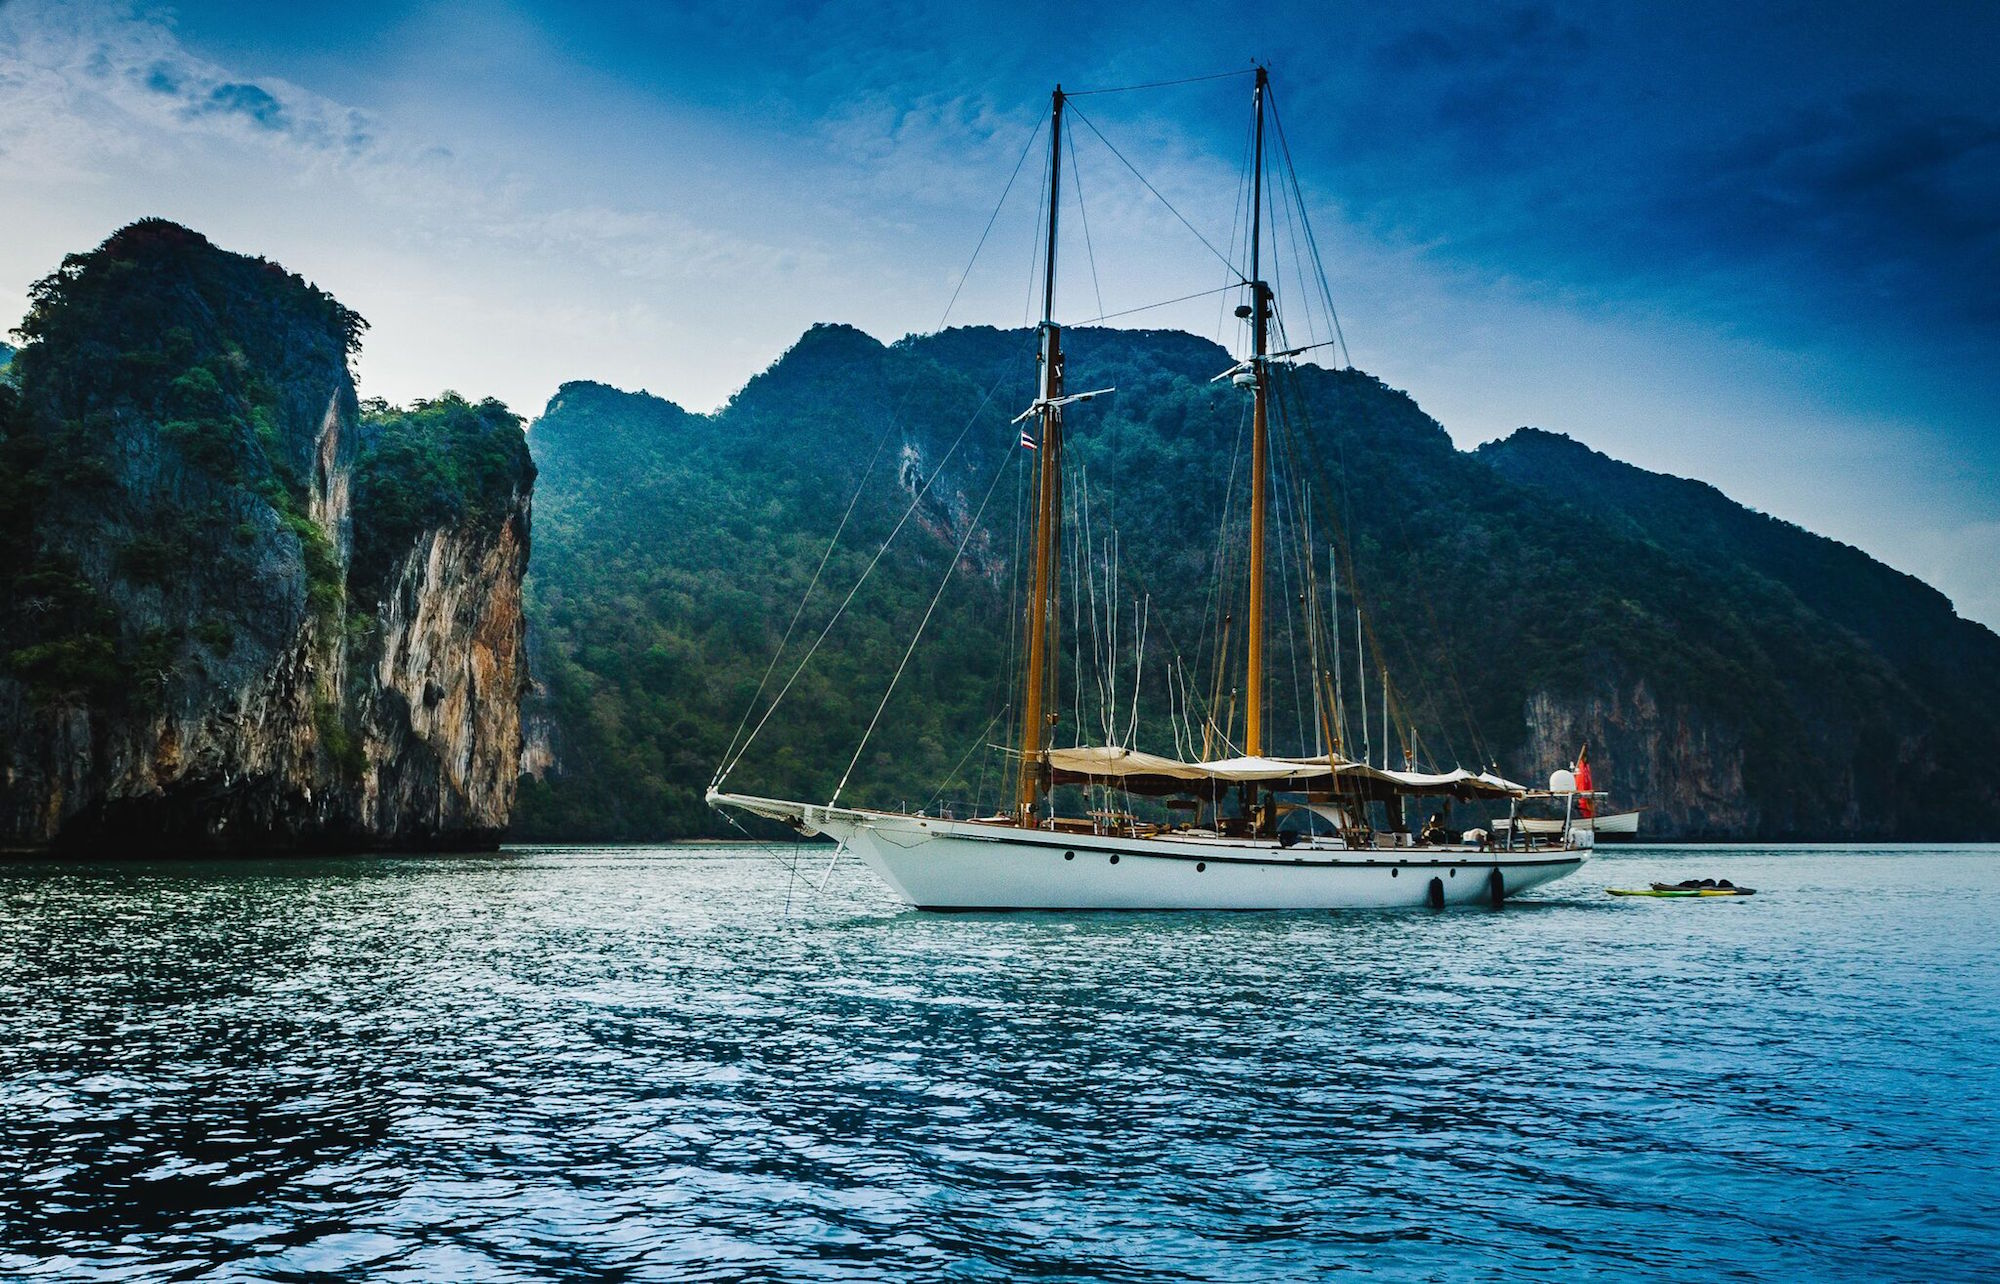 Dallinghoo_anchoring near luxuriant islands in Mergui Archipelago_M.jpg